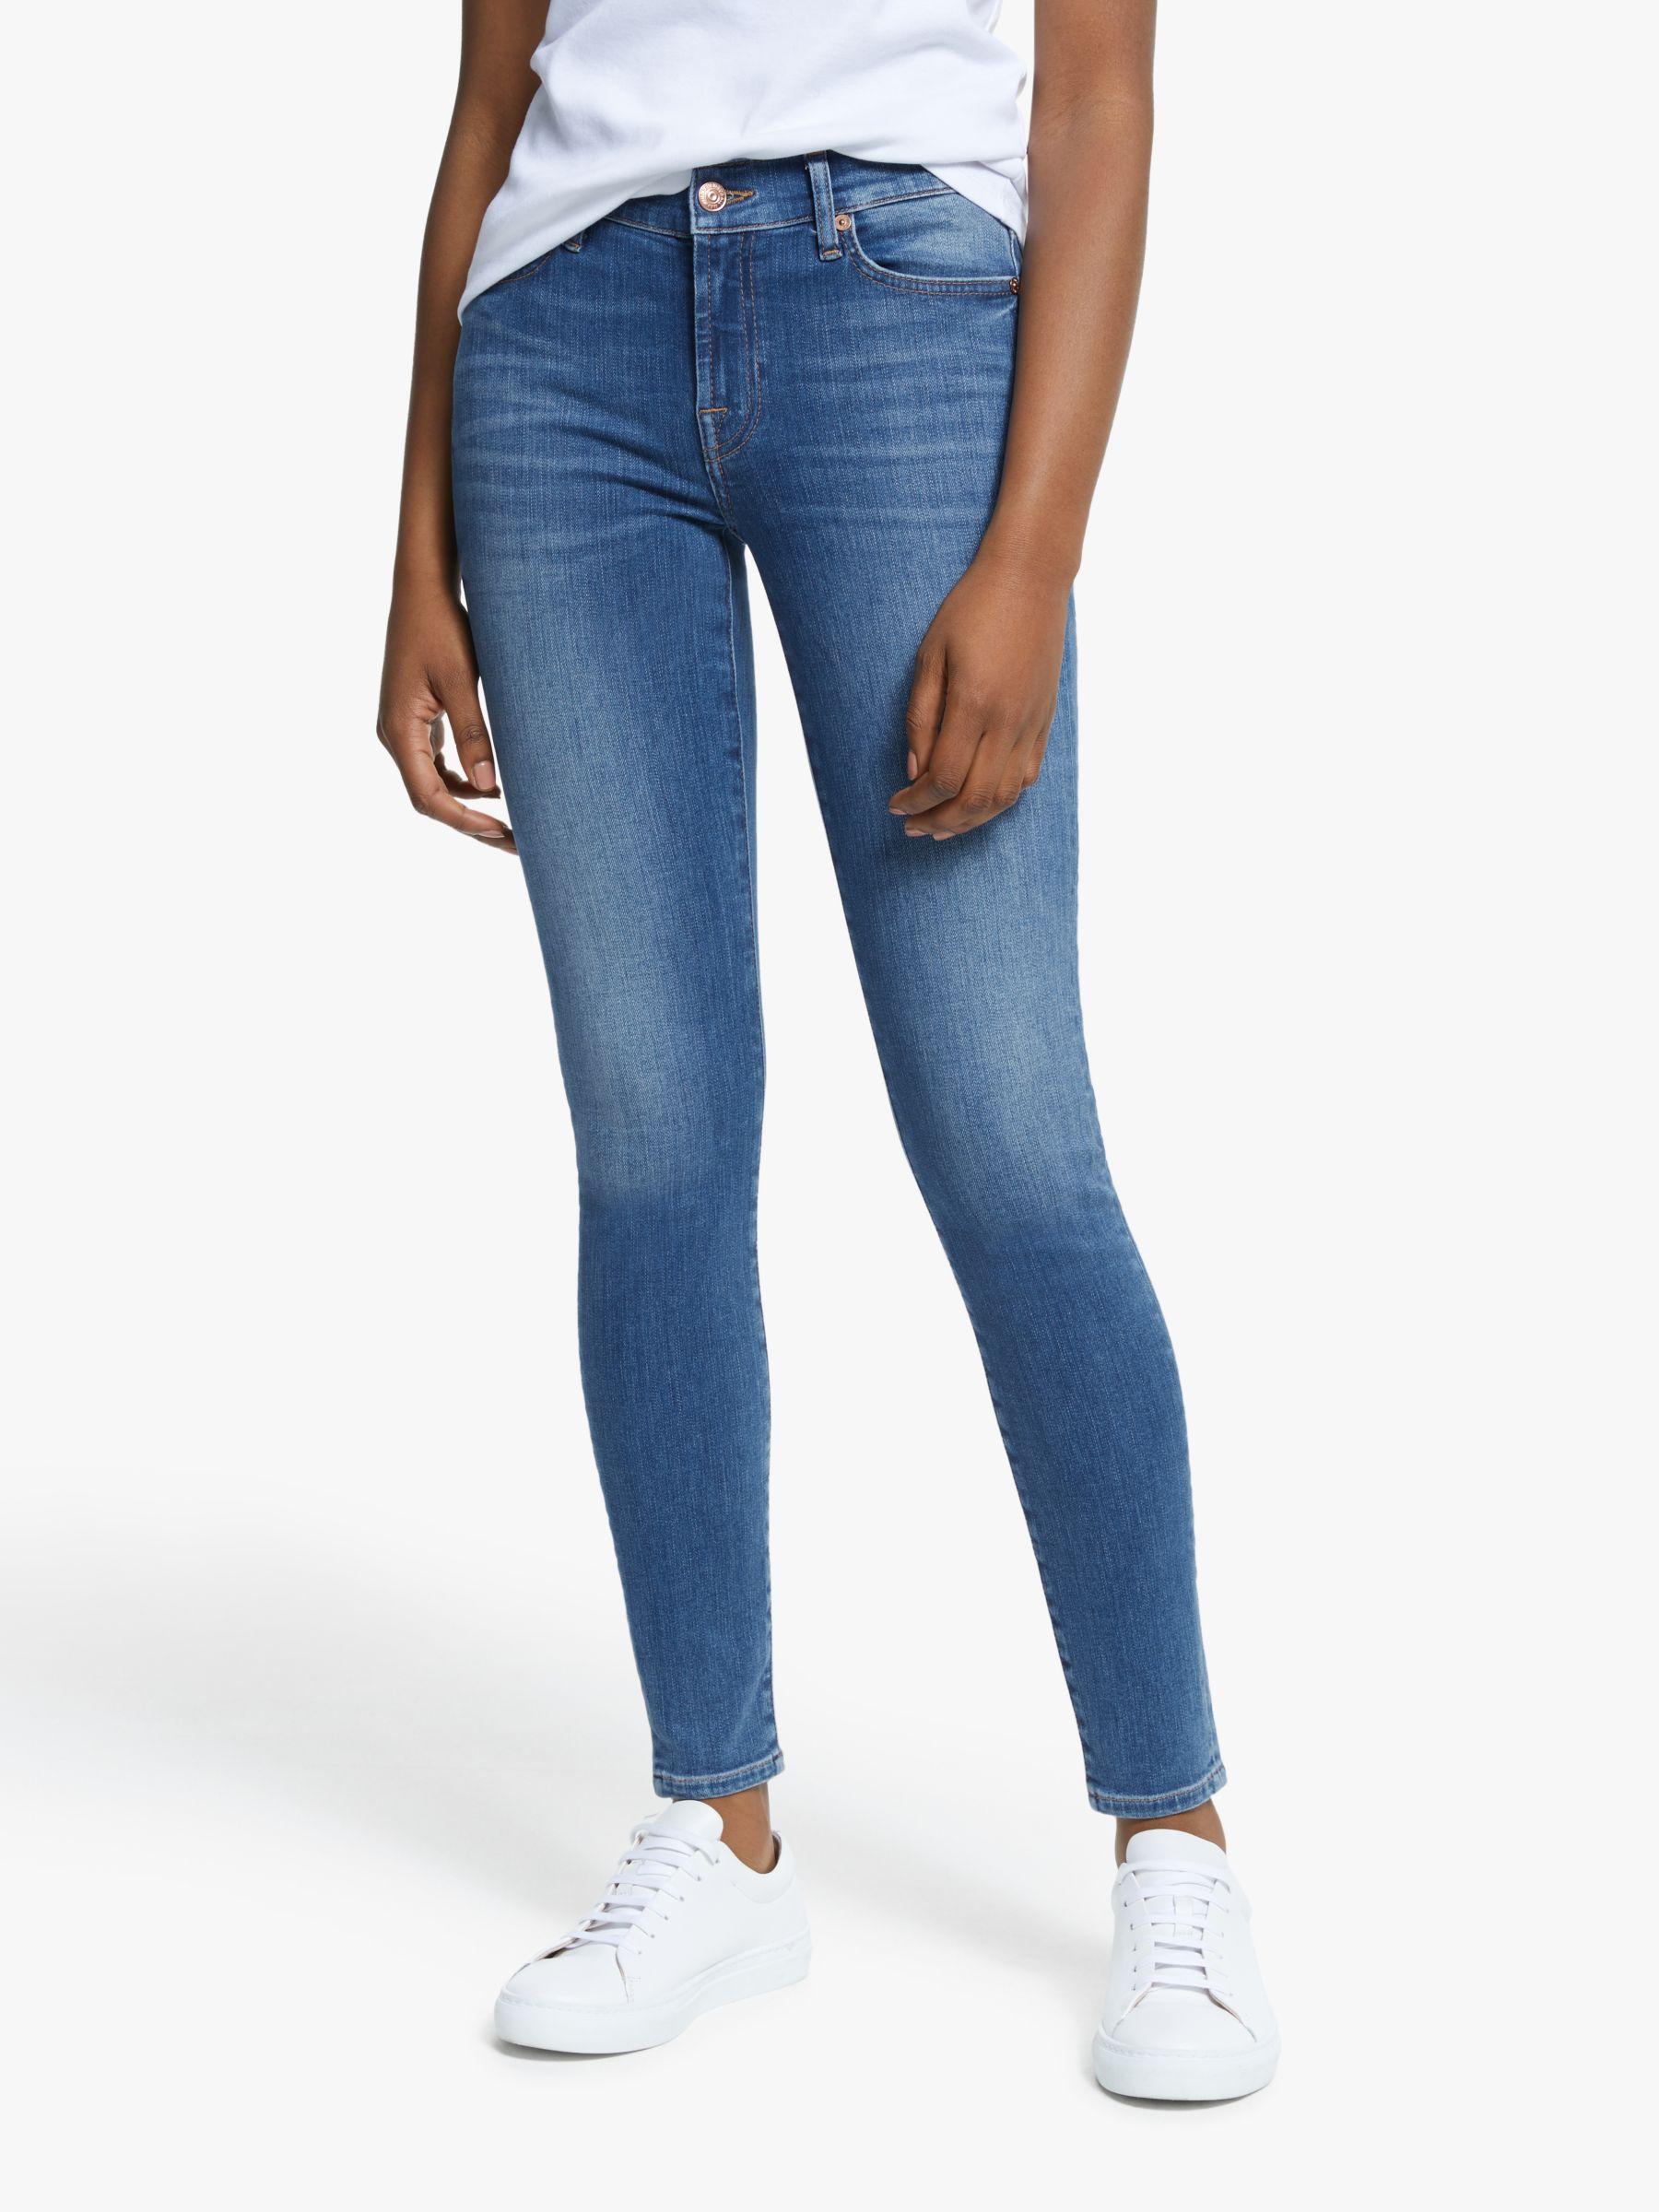 7 For All Mankind 7 For All Mankind Skinny Slim Illusion Crystal Pocket Jeans, Possessed Light Blue